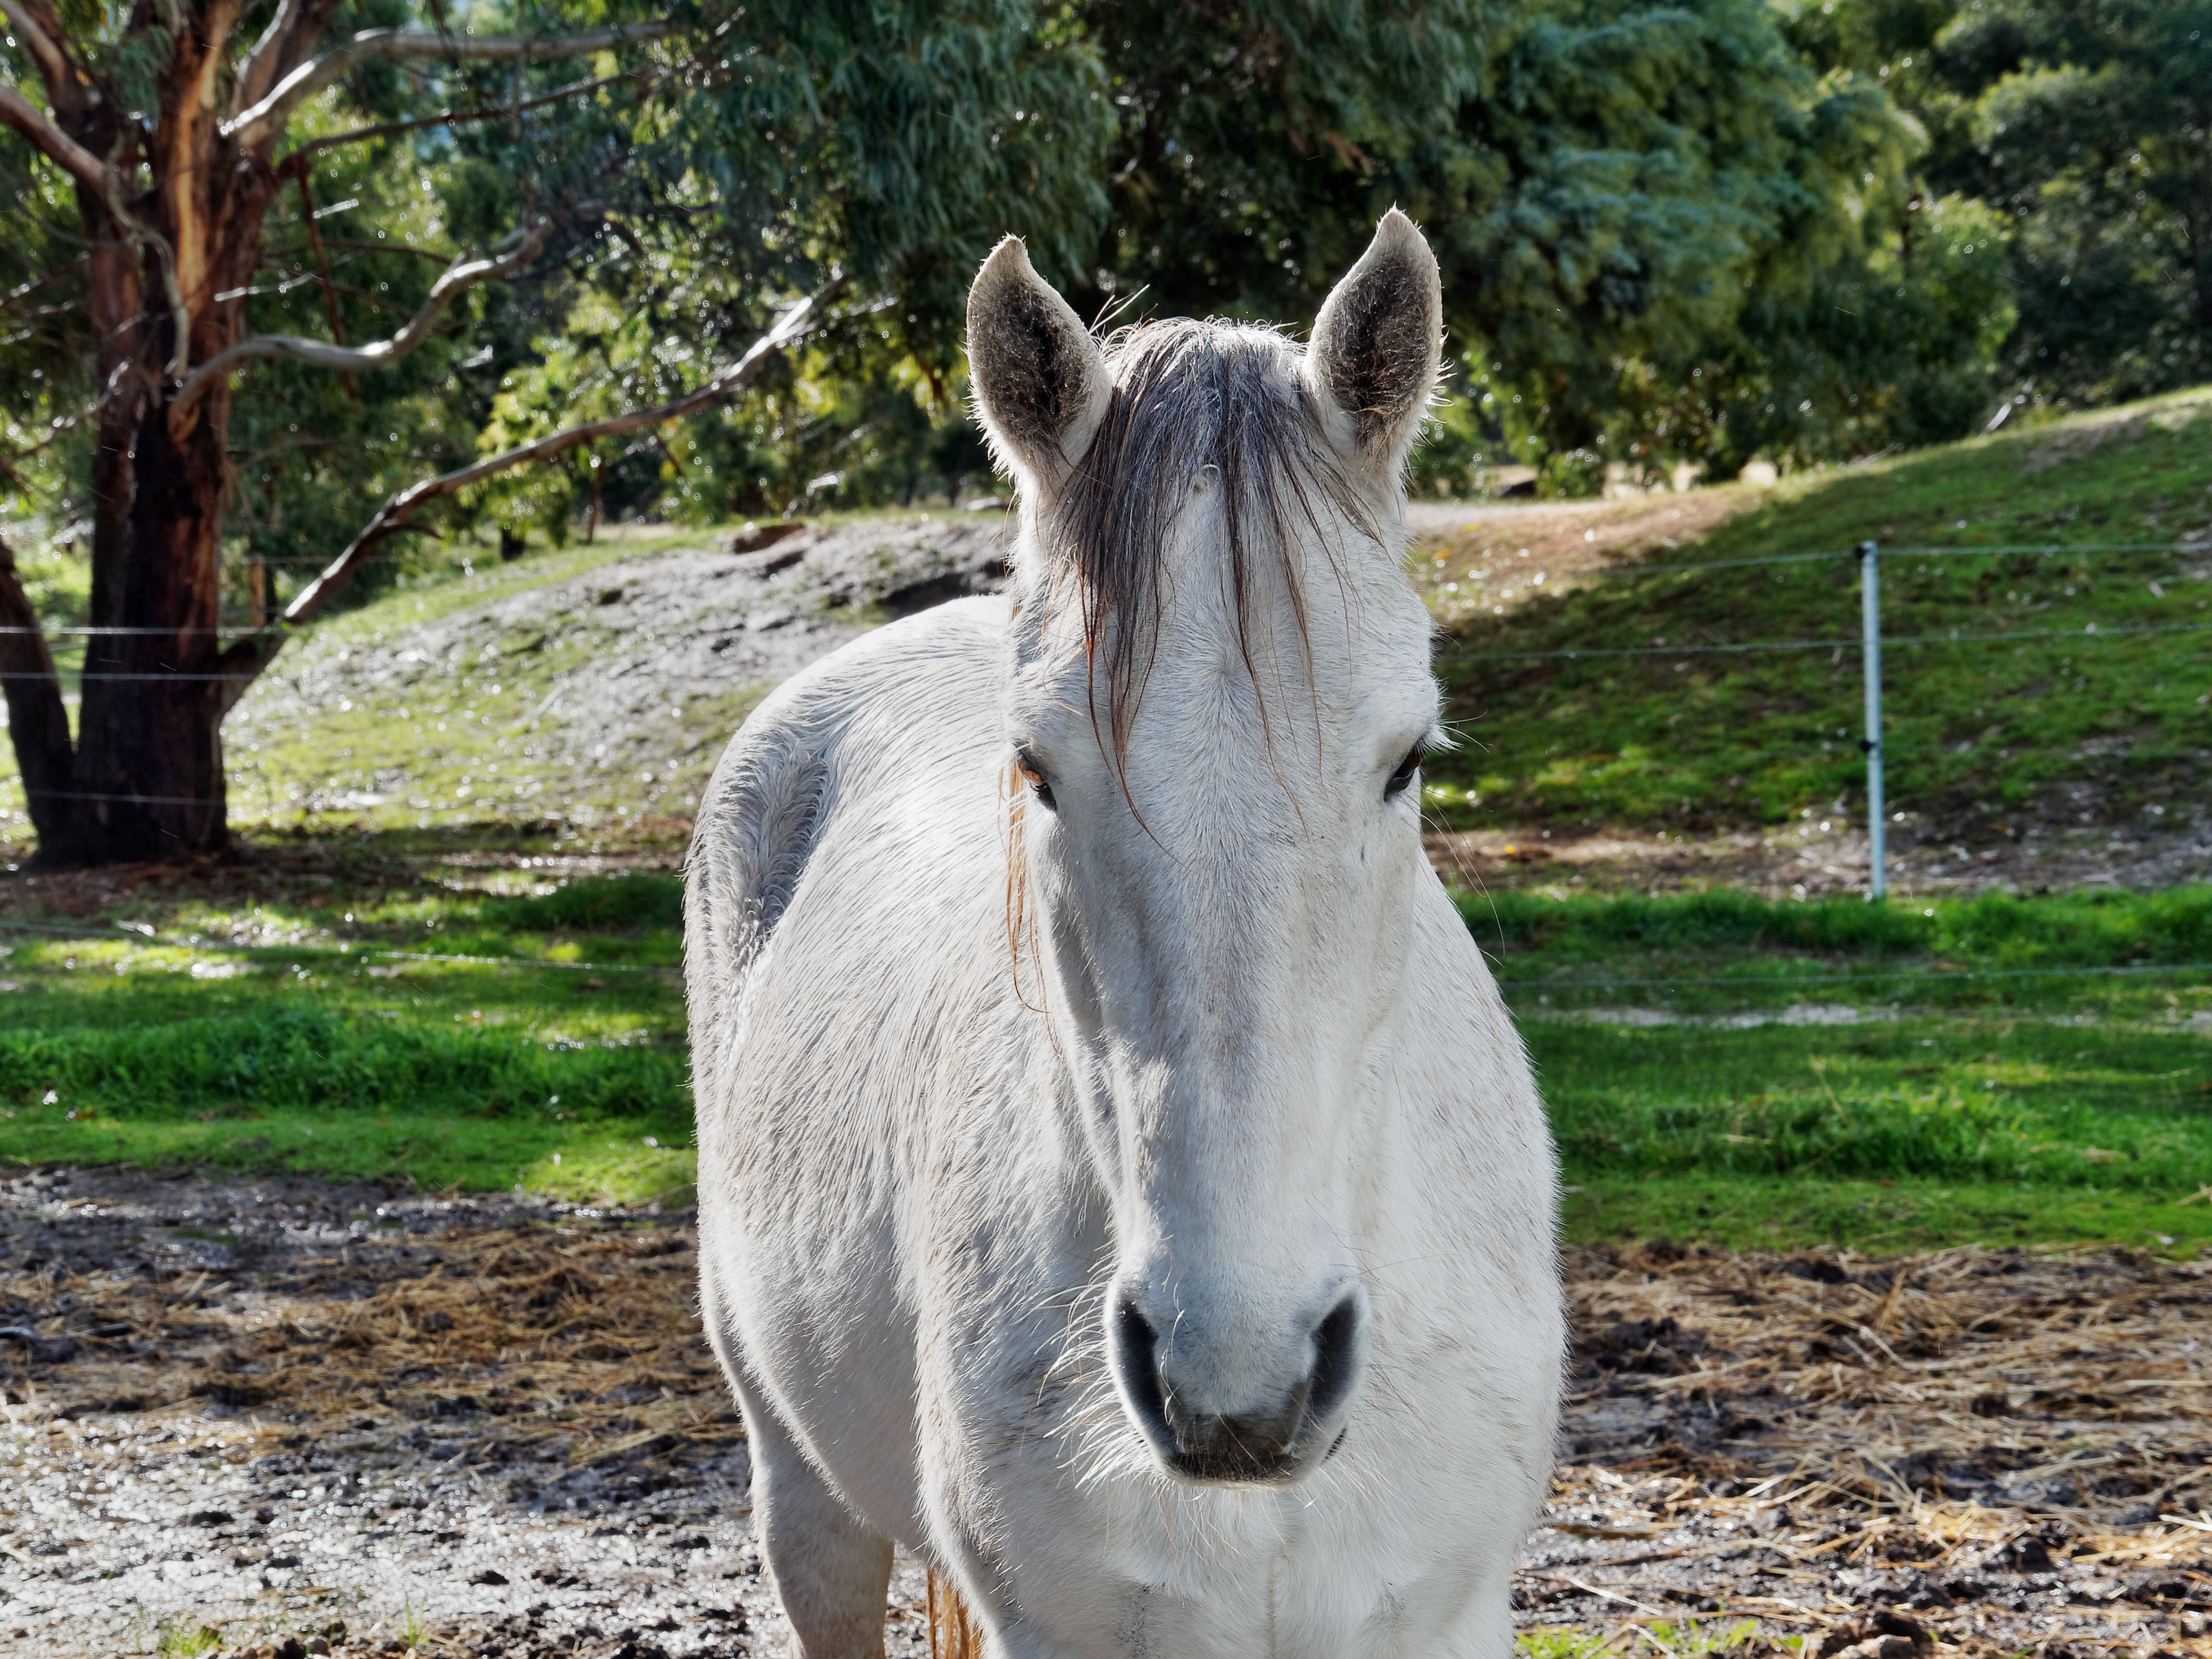 Horses-48.jpeg